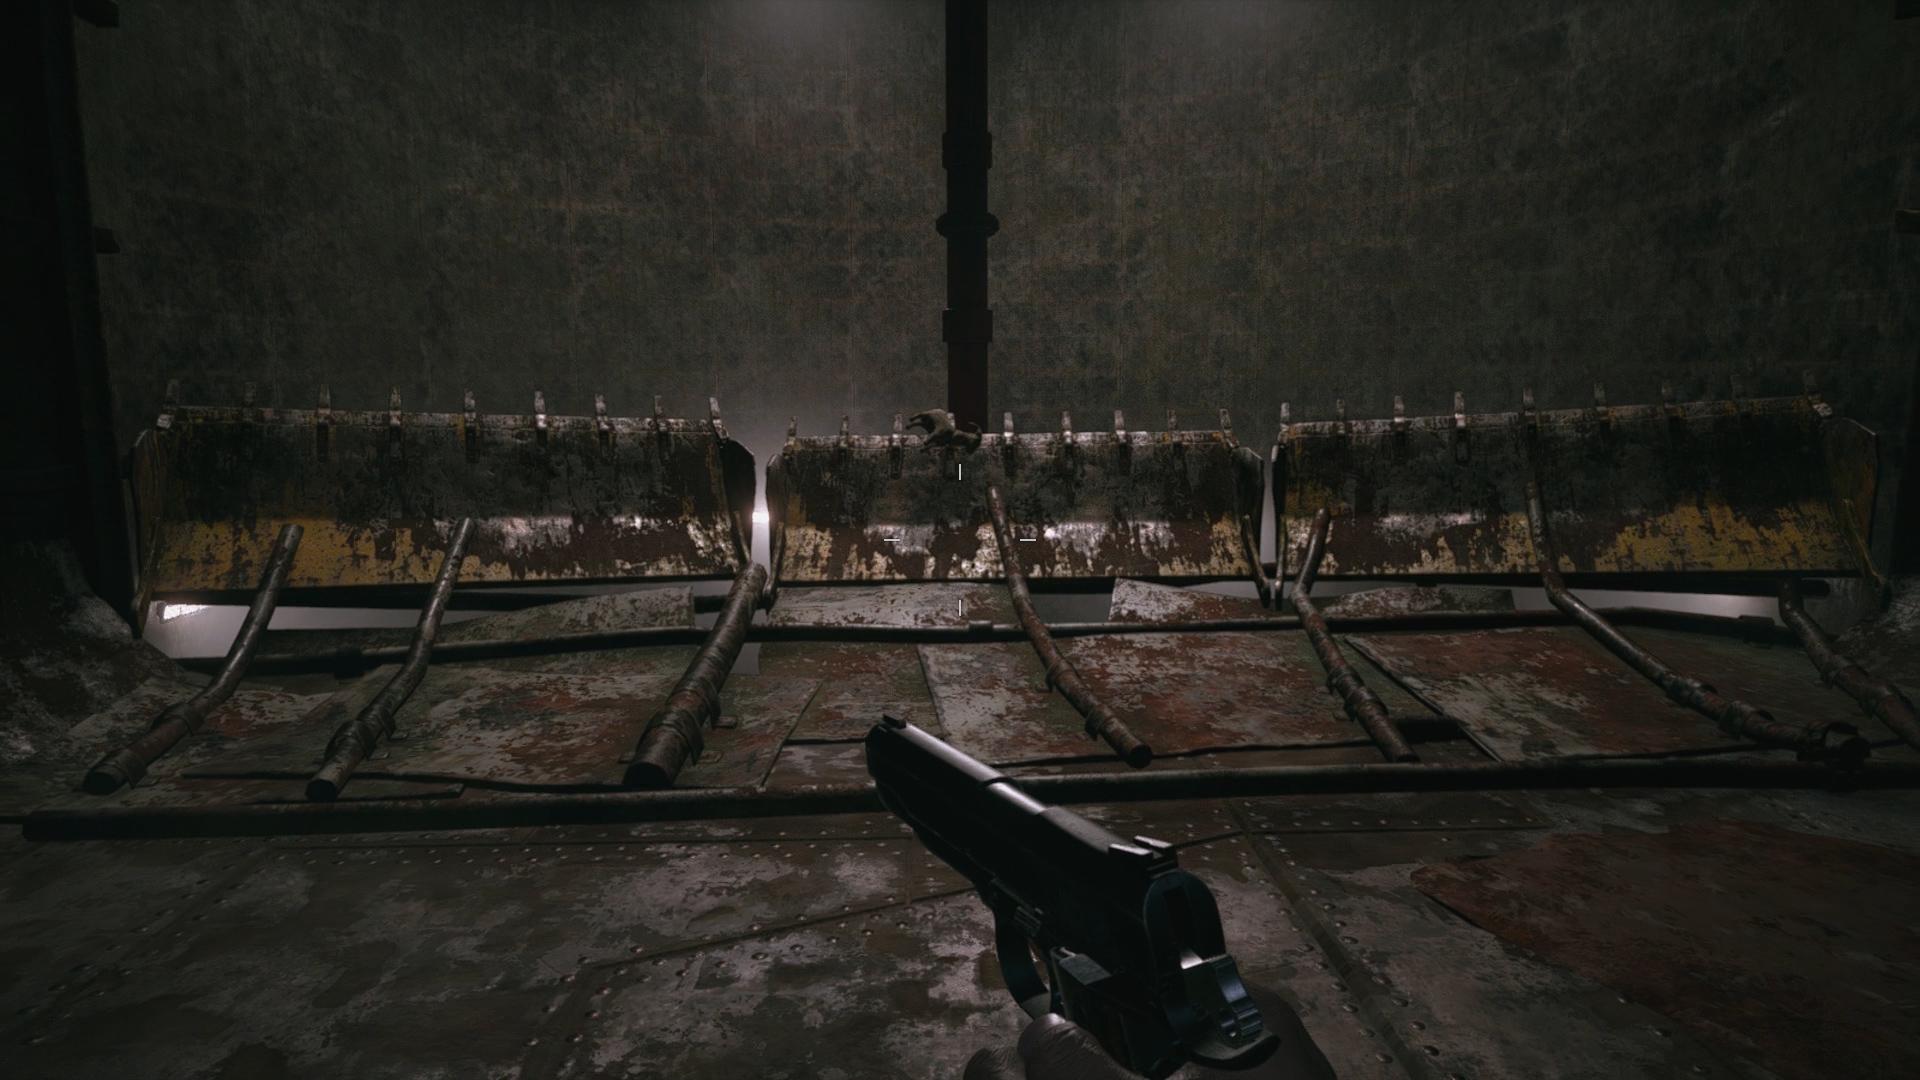 resident evil village goat of warding ventilation duct heisenbergs factory